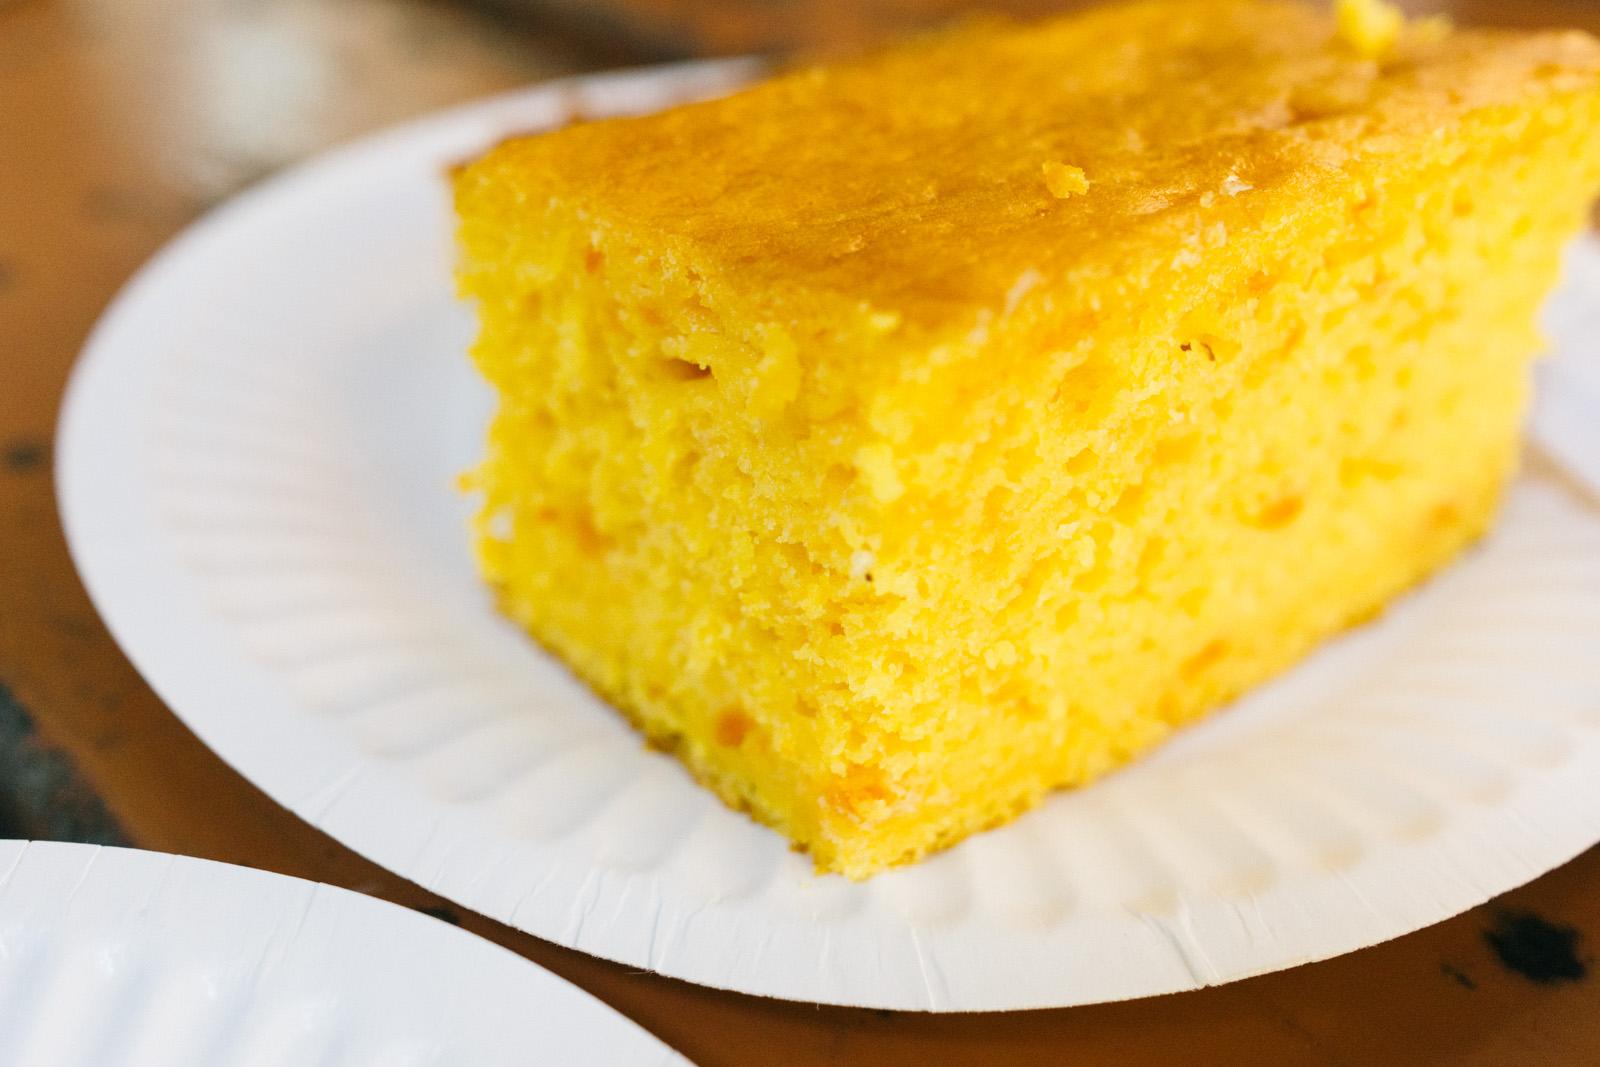 that-food-cray-margarets-cafe-e-nata-macau-portuguese-egg-tarts-5